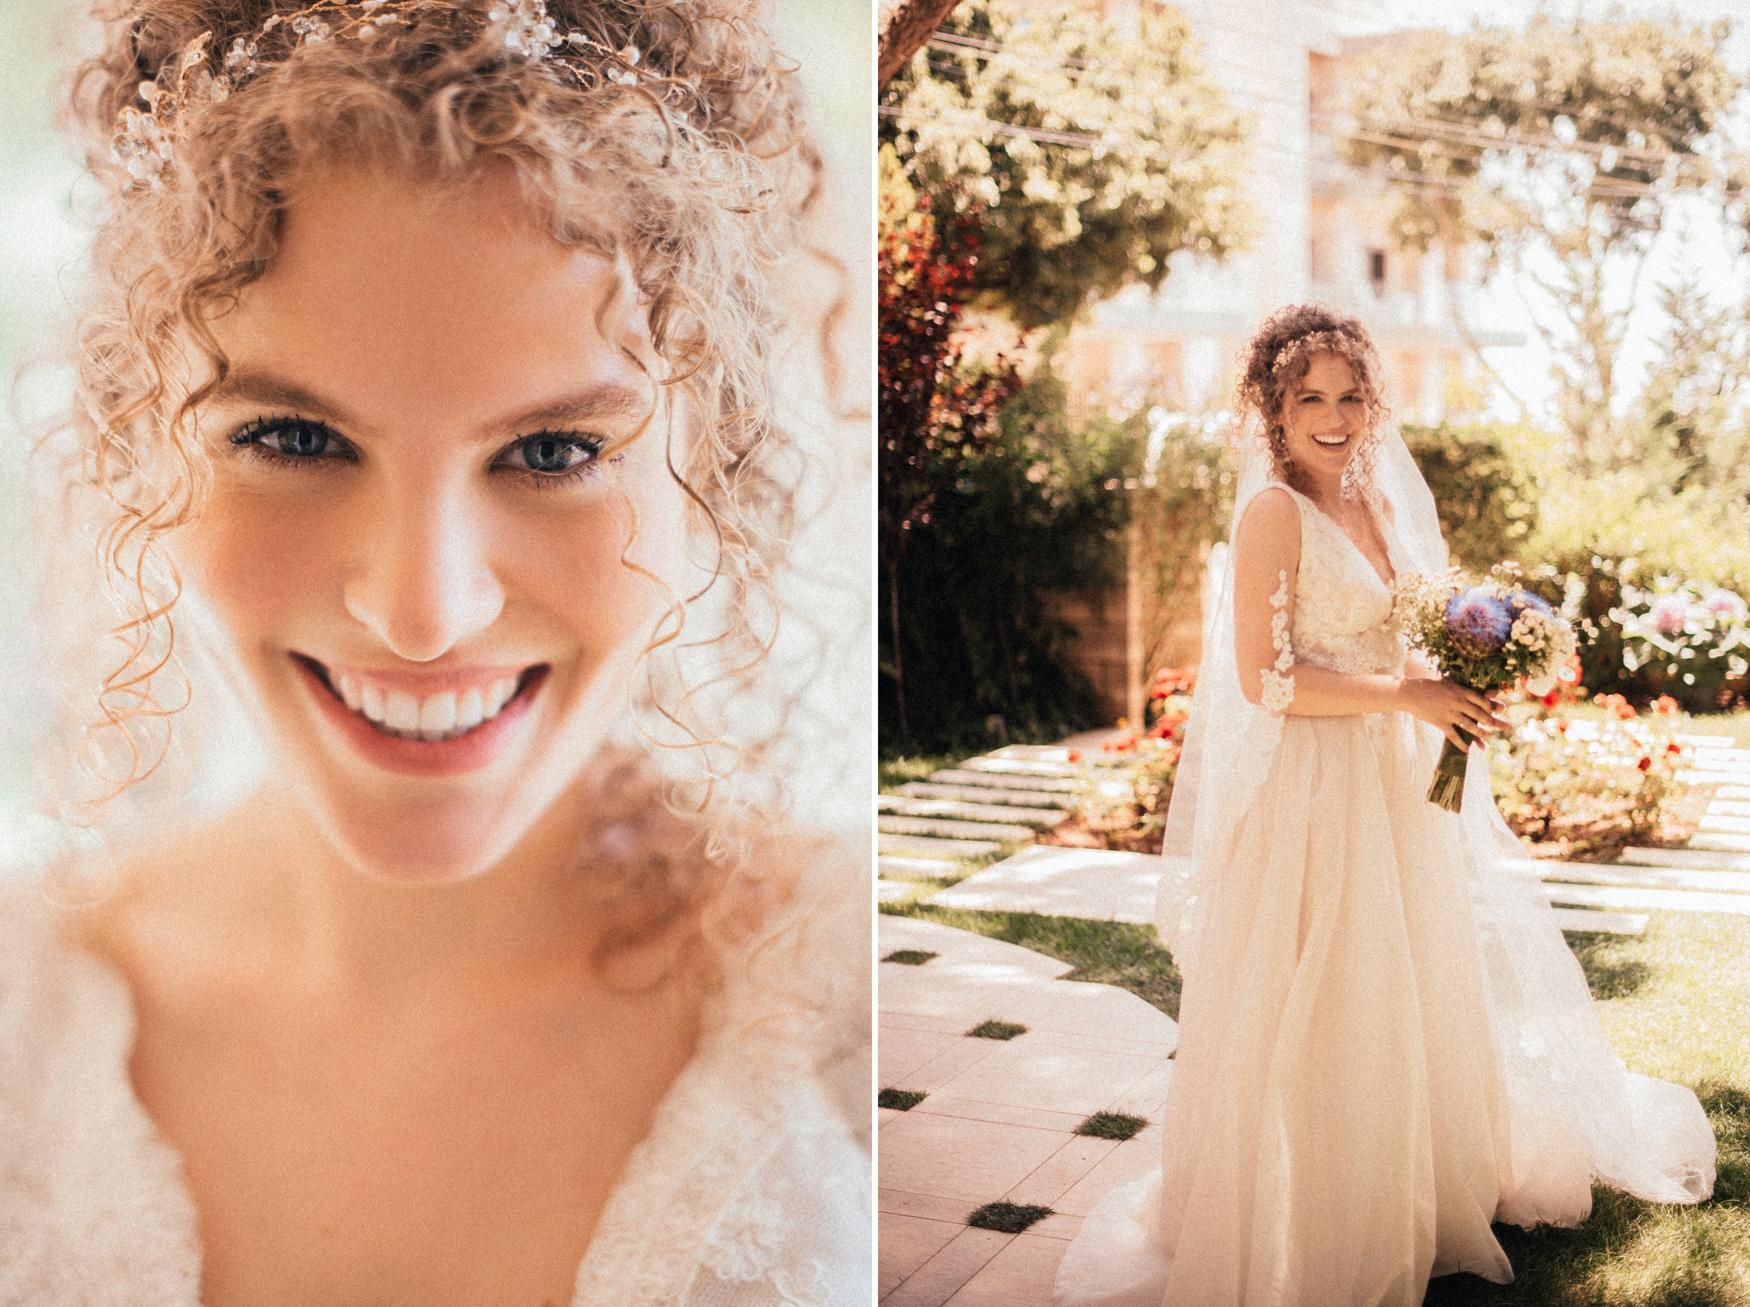 LR2 beirut byblos wedding photographer lebanon 022.jpg